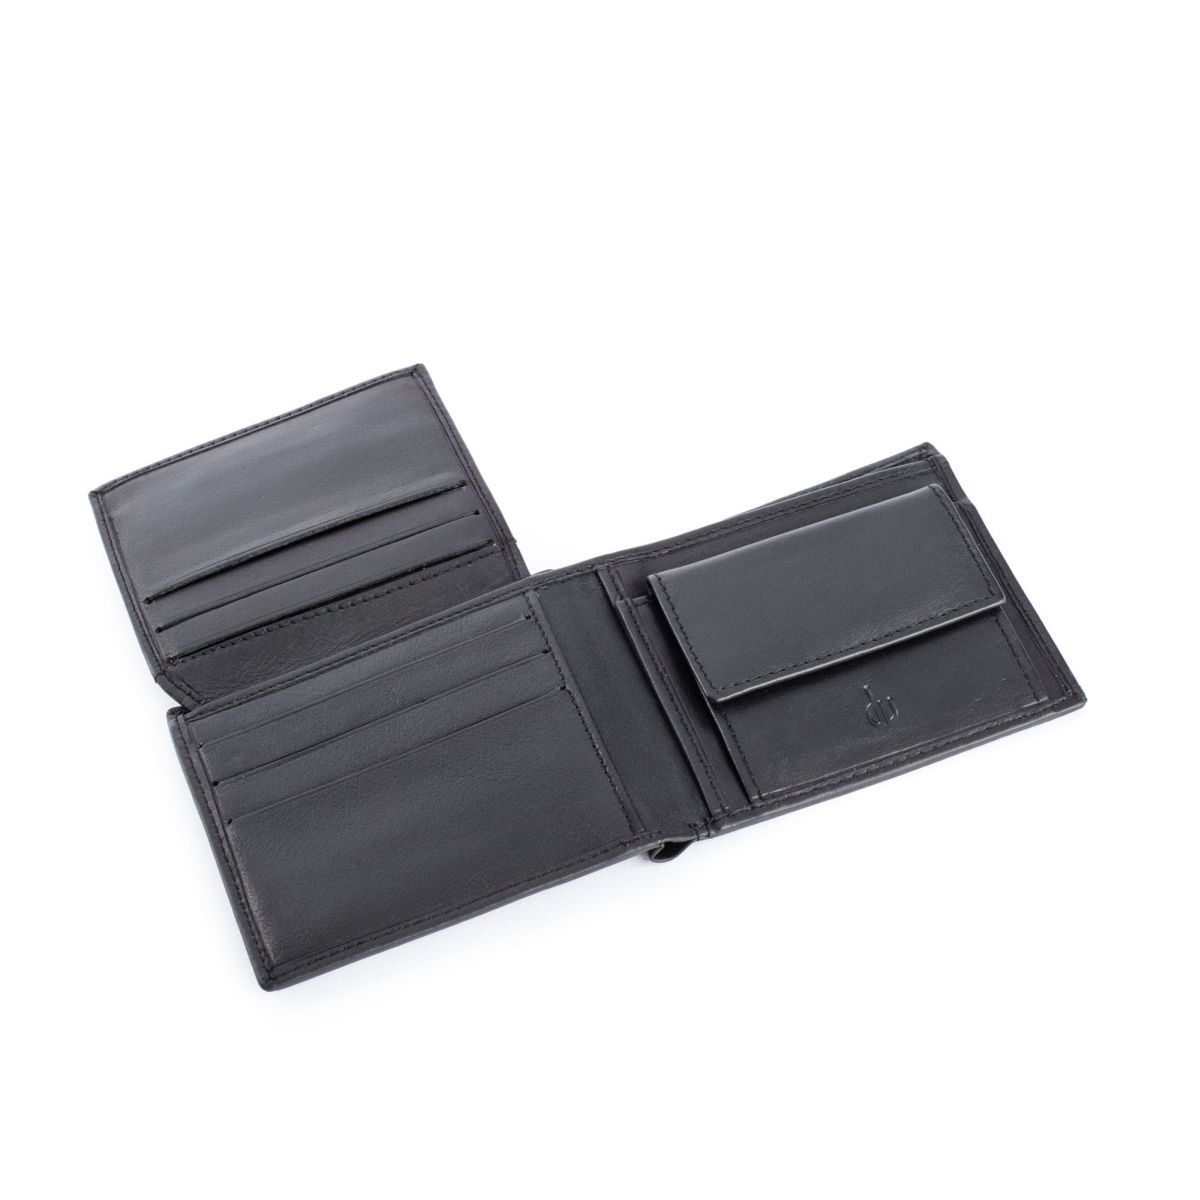 dv ארנק עור קומפקטי עם תא למטבעות - שחור